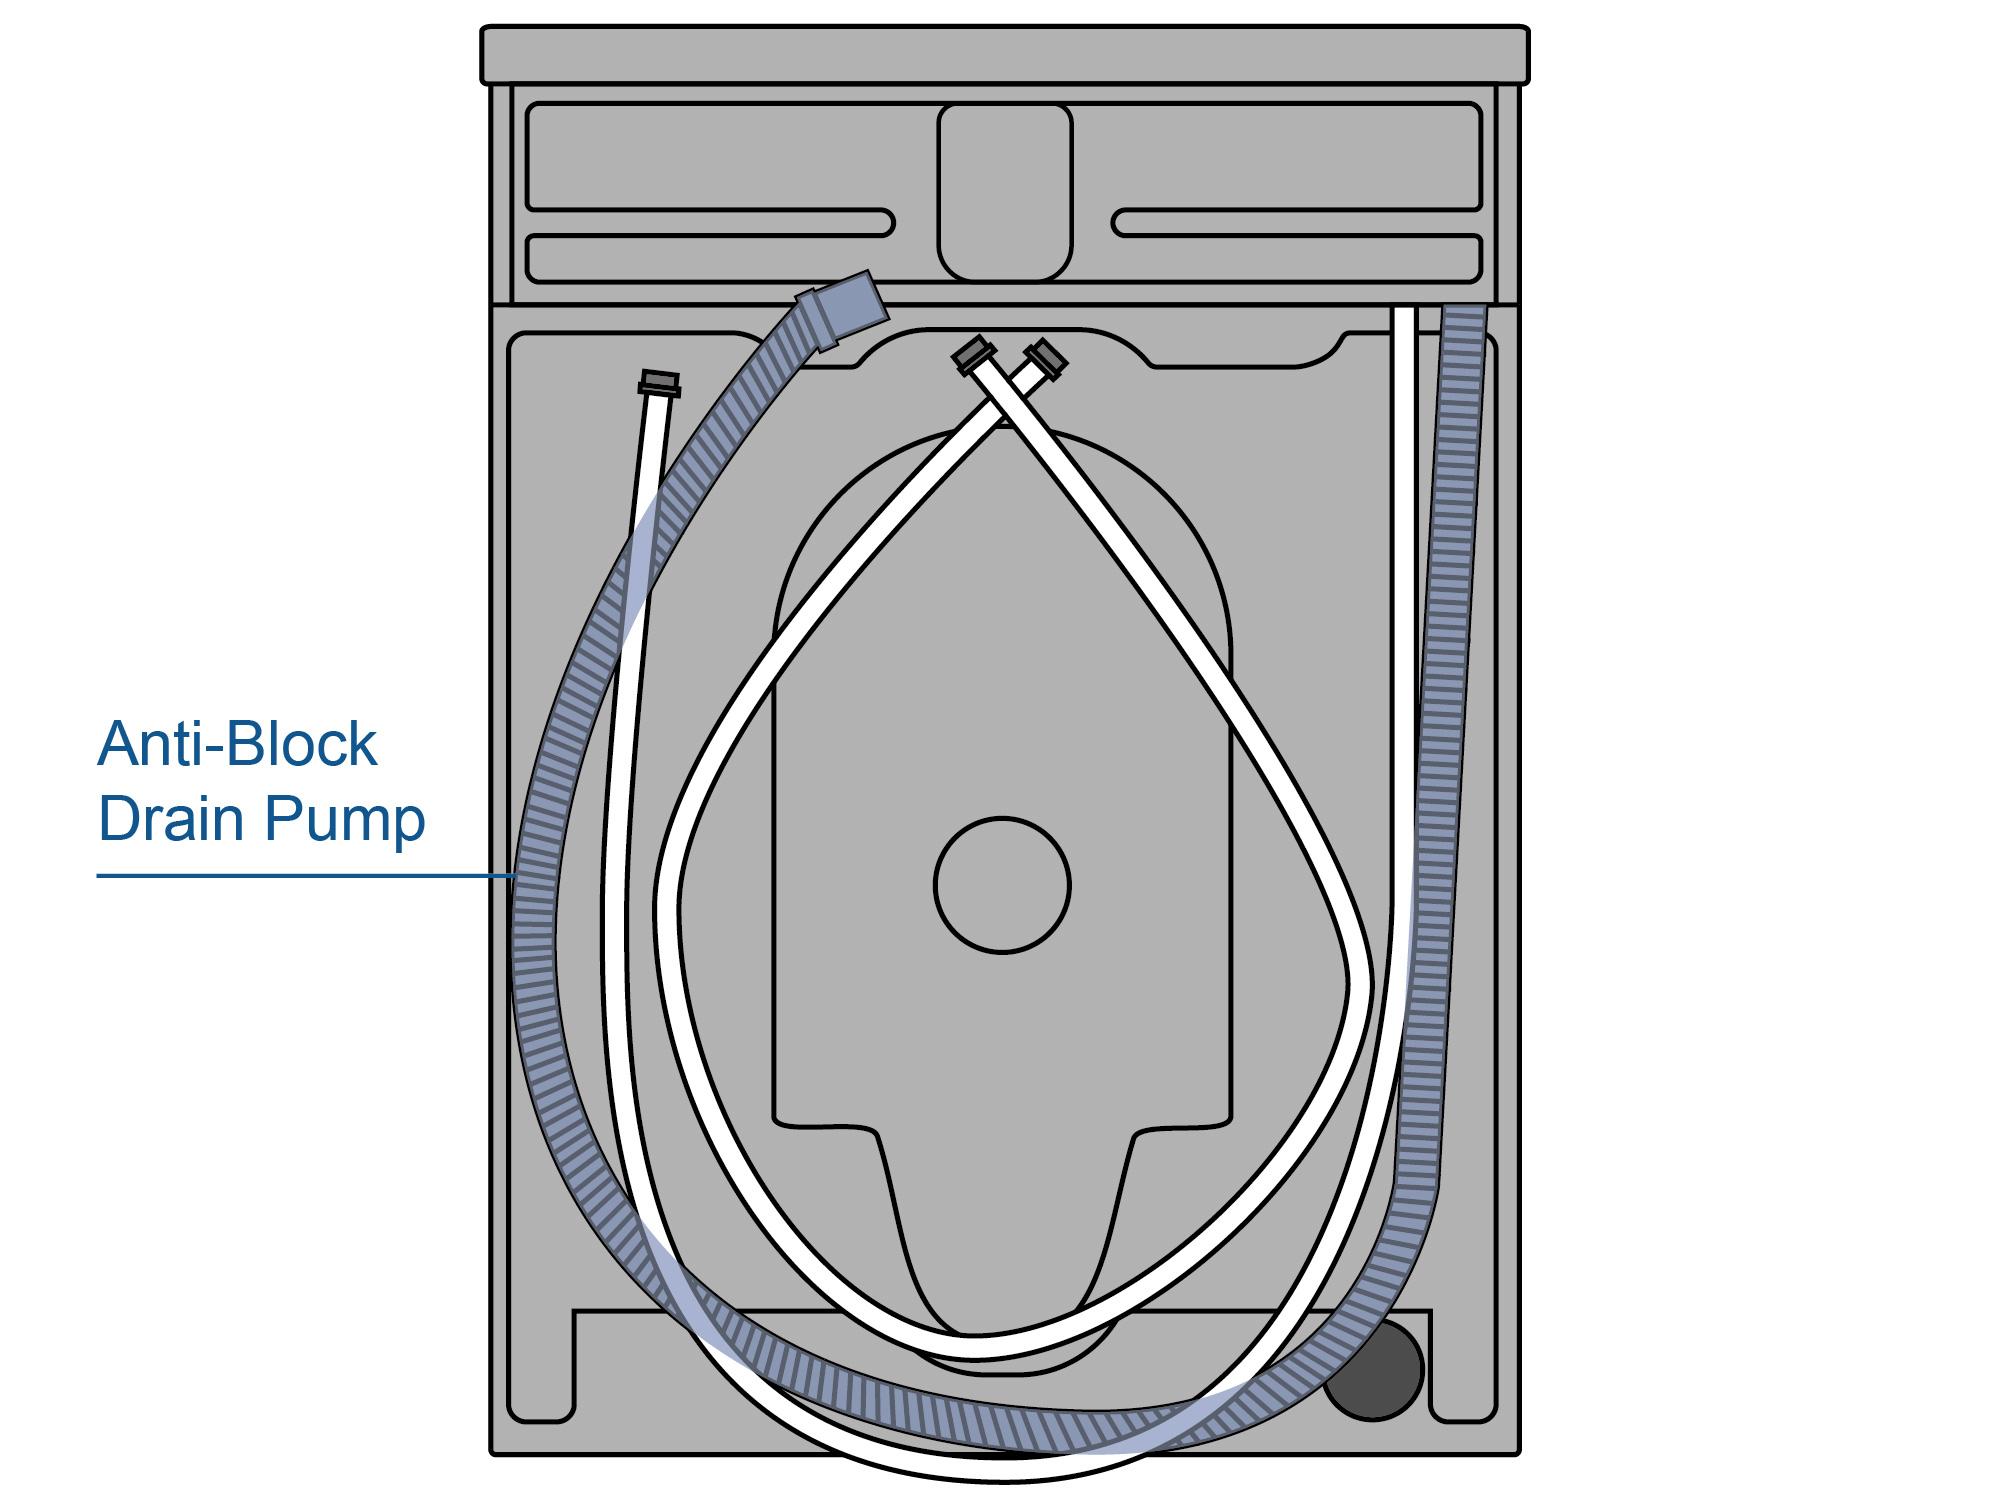 Illustration of Anti Block Drain Pump